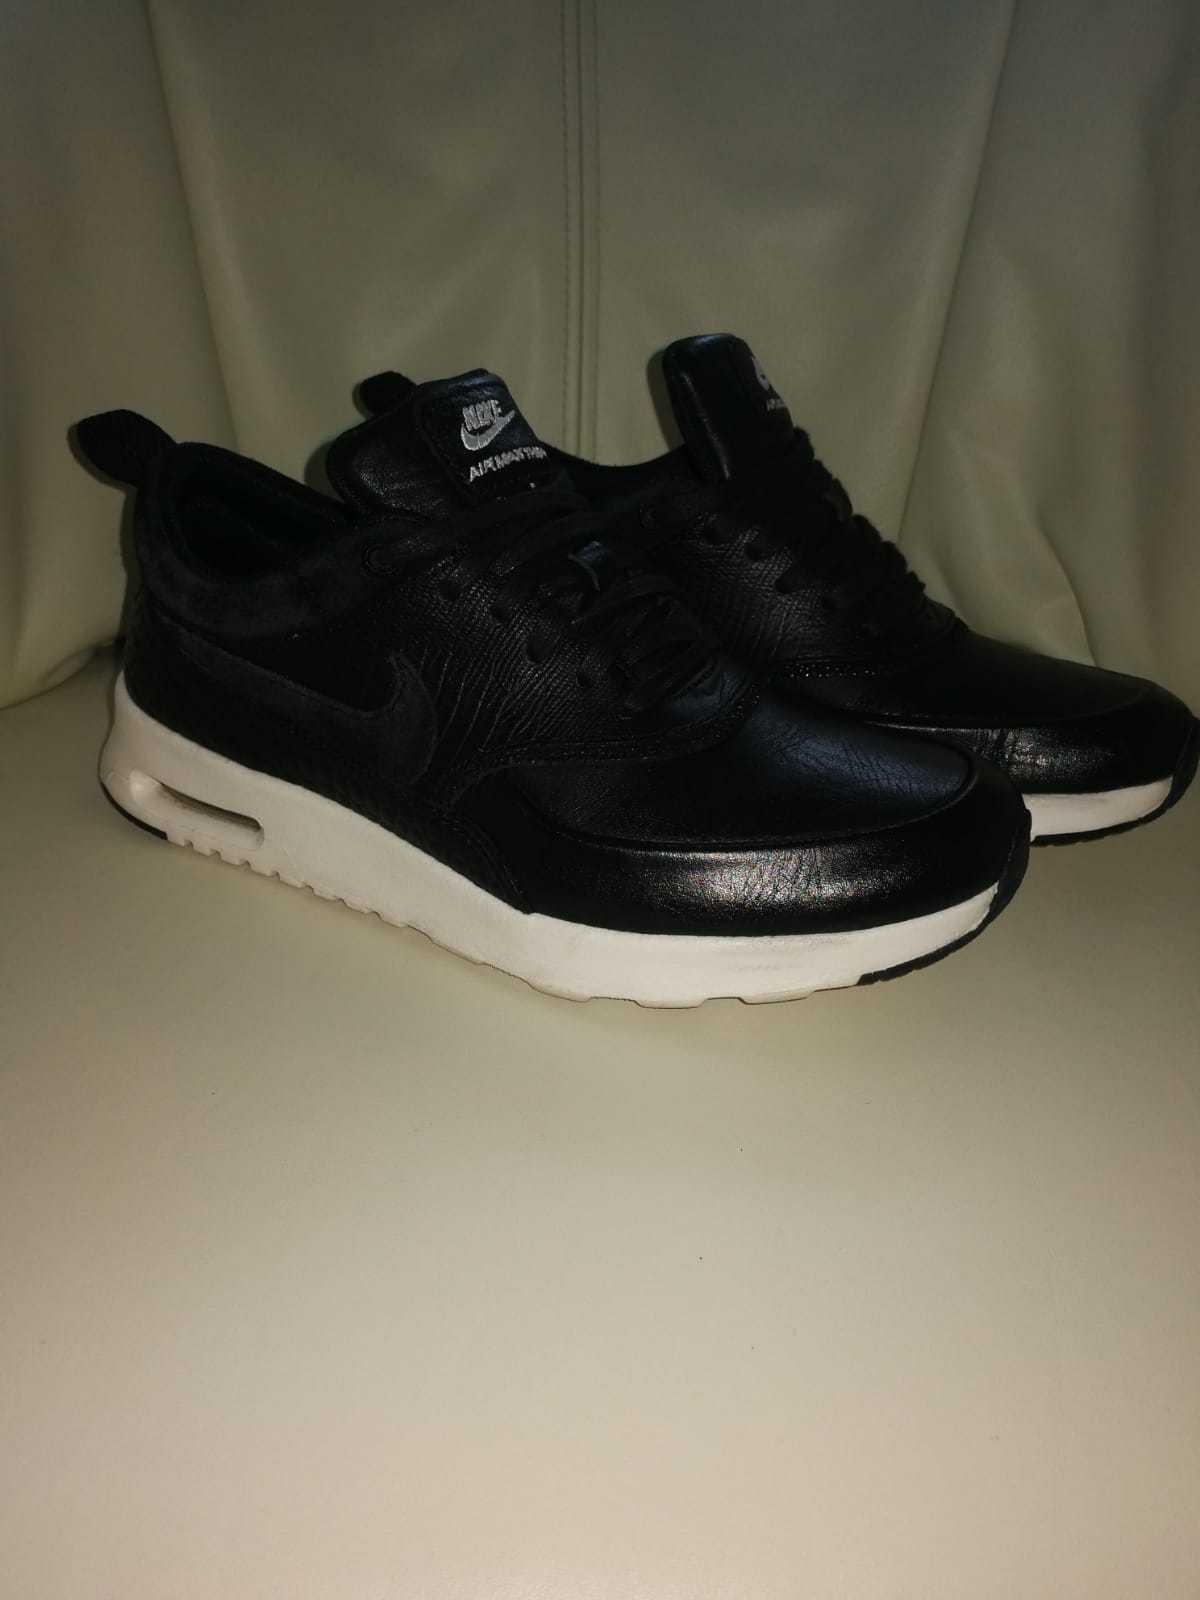 Nike air max thea sneaker sportschuhe 38 neu